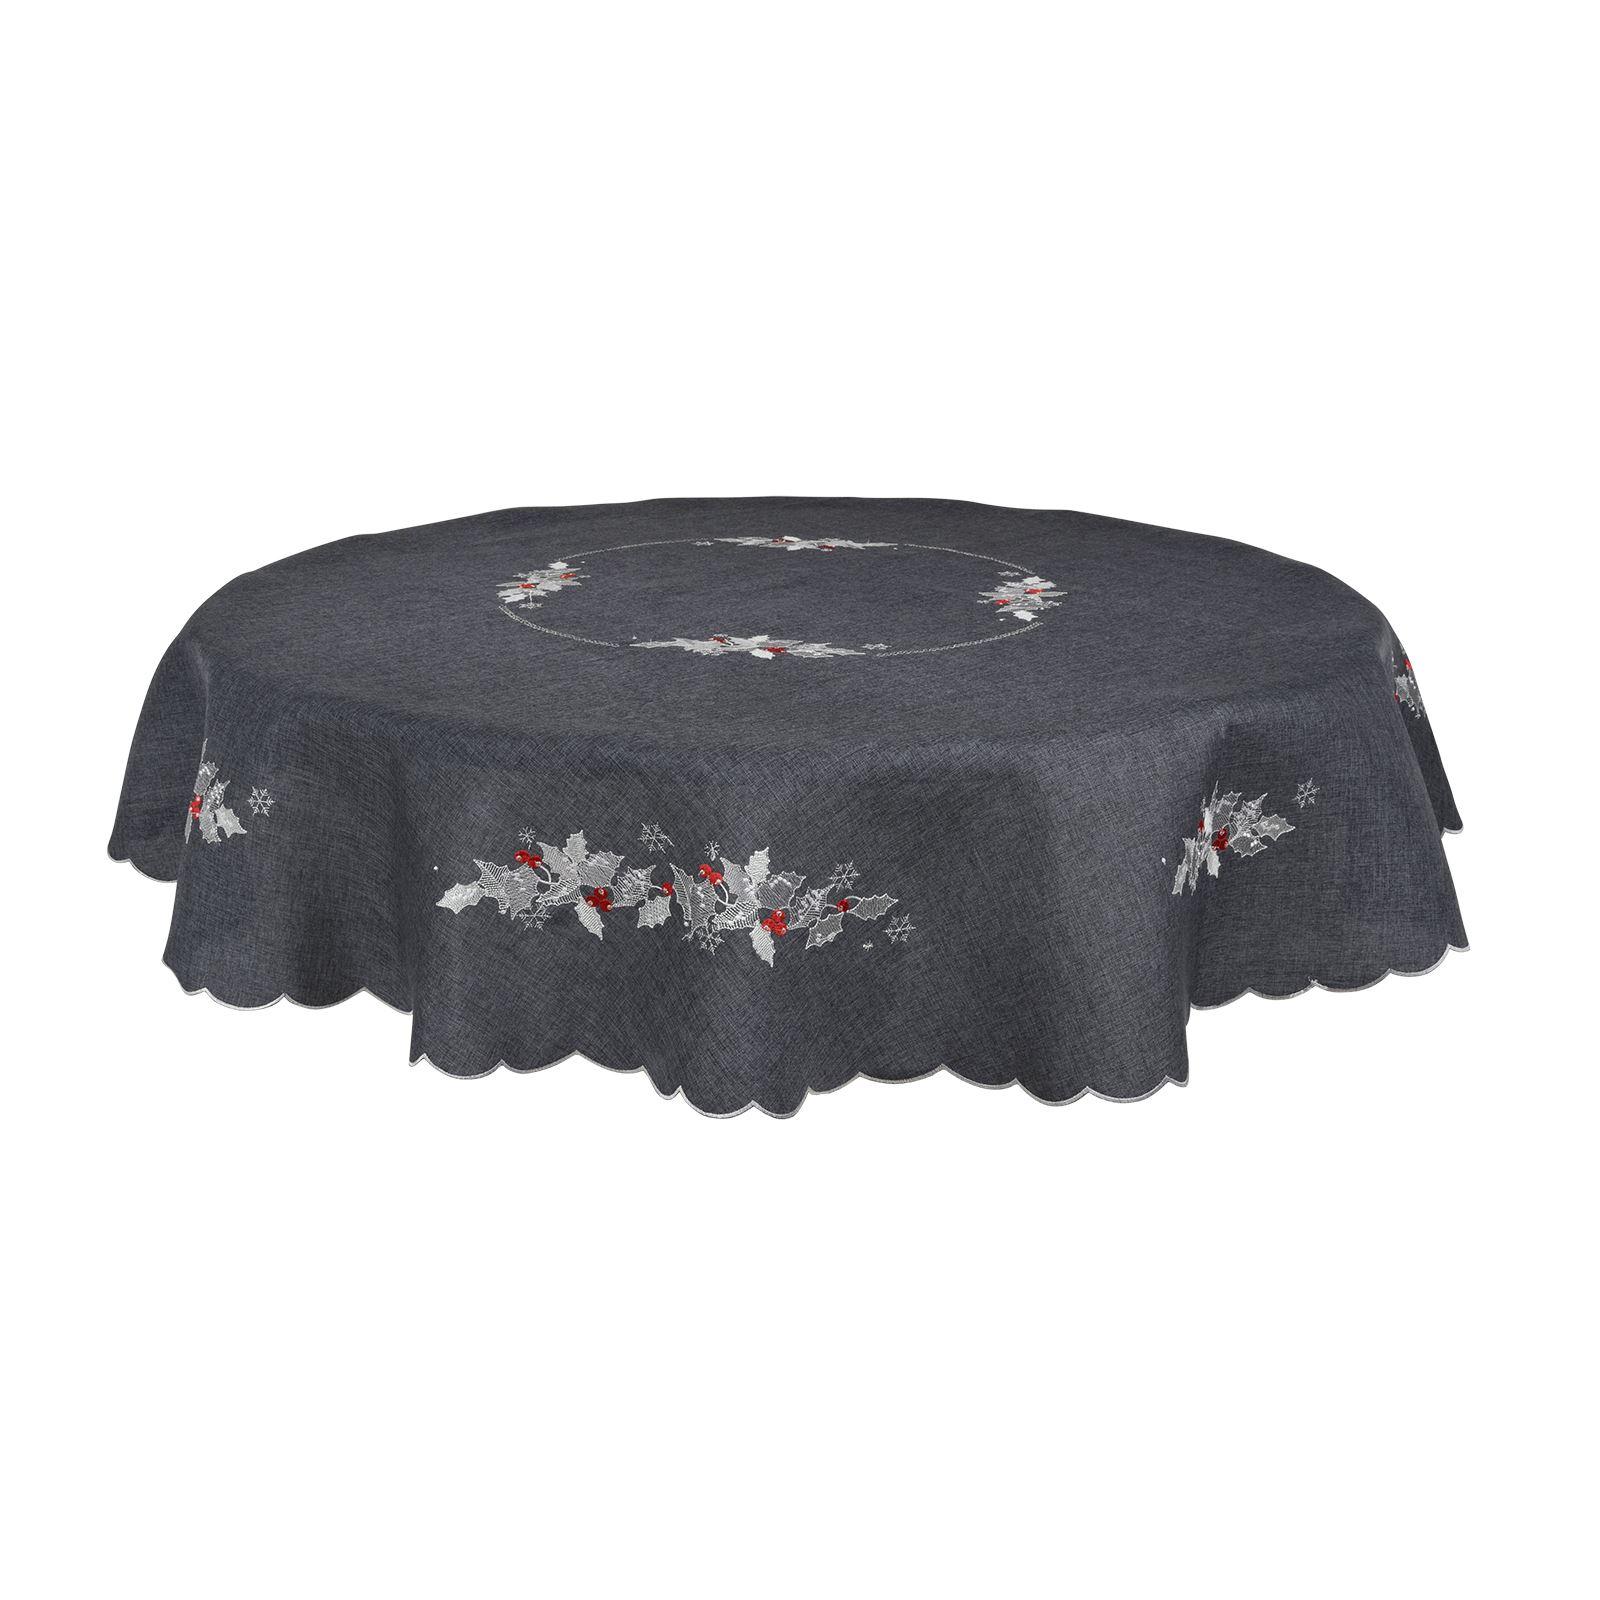 Christmas-Tablecloth-Festive-Pattern-Rectangle-Round-Fabric-Xmas-Room-Decoration Indexbild 95